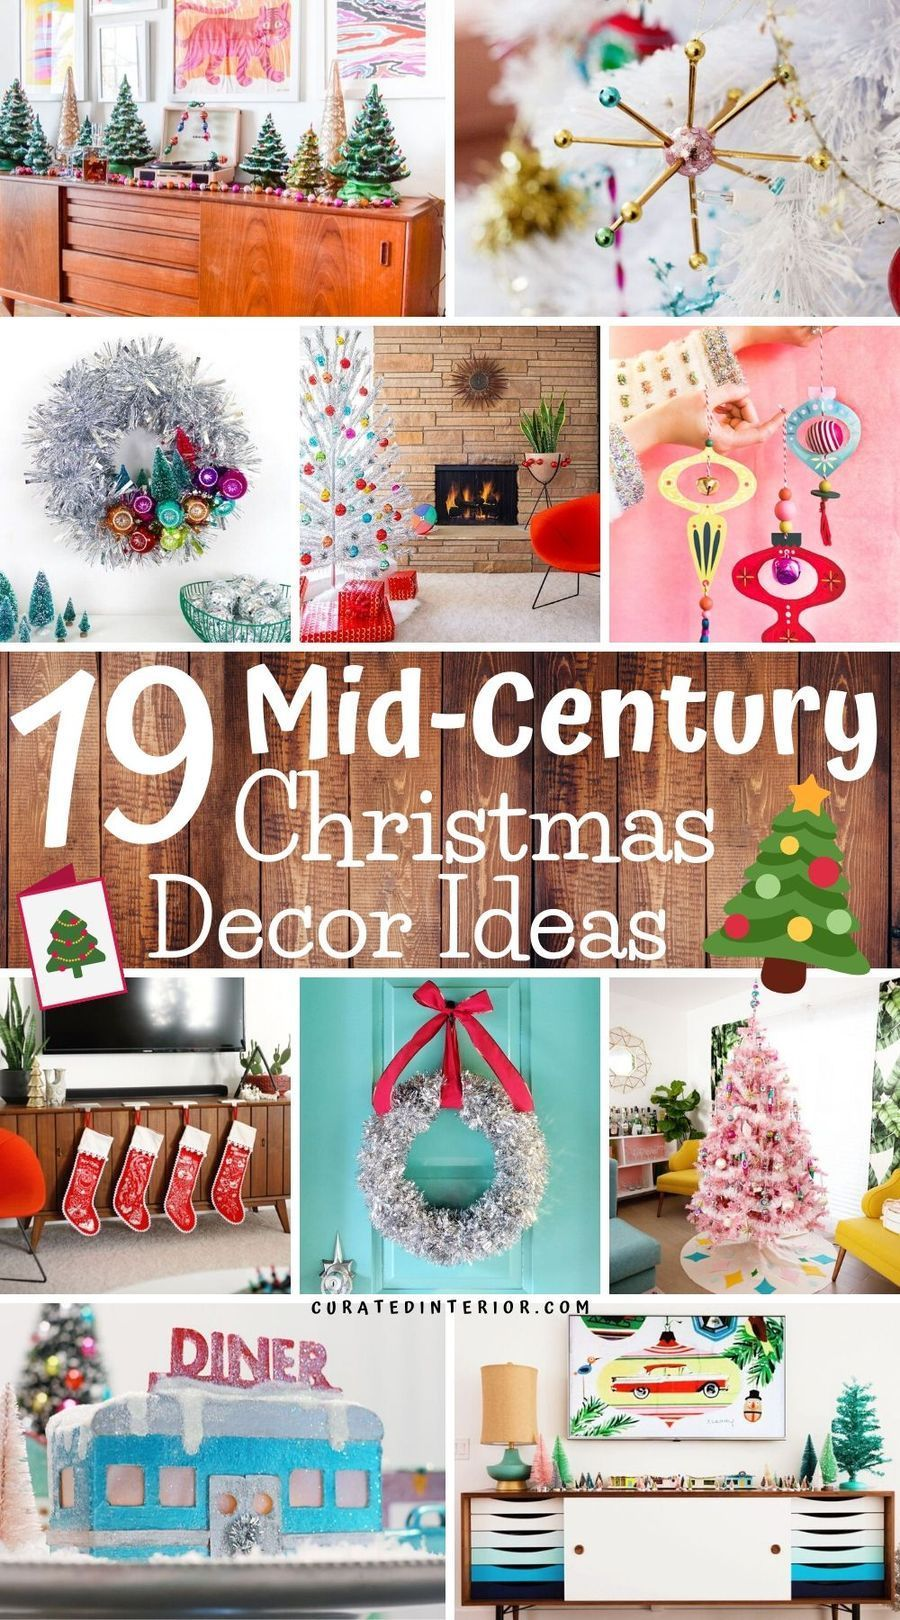 19 Mid Century Modern Christmas Decor Ideas Modern Christmas Decor Retro Christmas Decorations Mid Century Modern Christmas